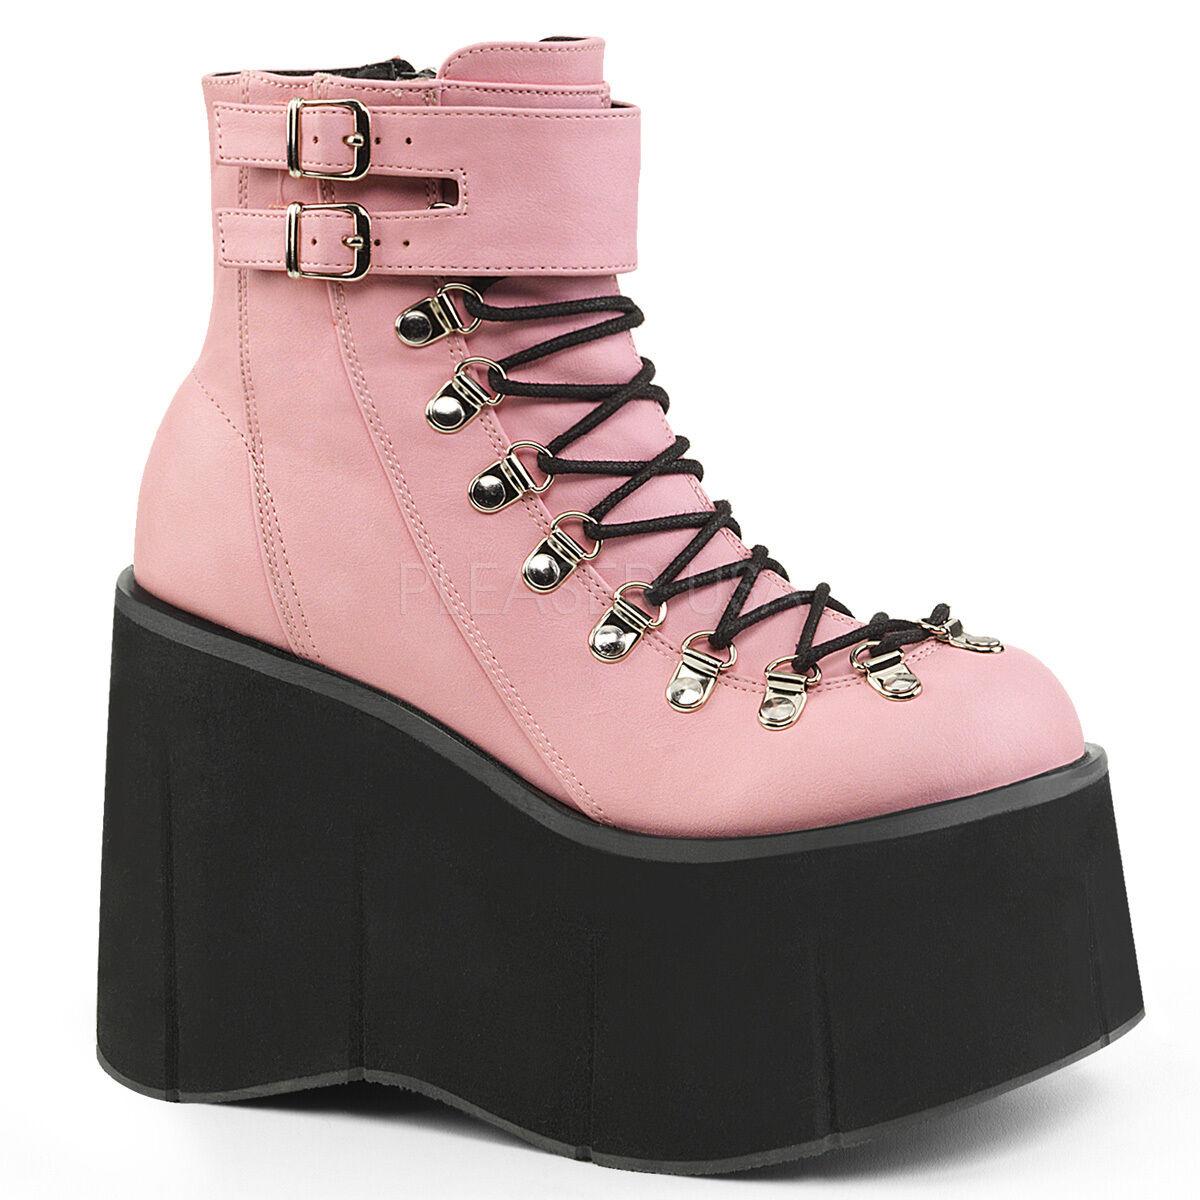 DEMONIA Gothic Punk Gogo Dancer Raver 4 1 2  Platform Rosa Ankle High Stiefel